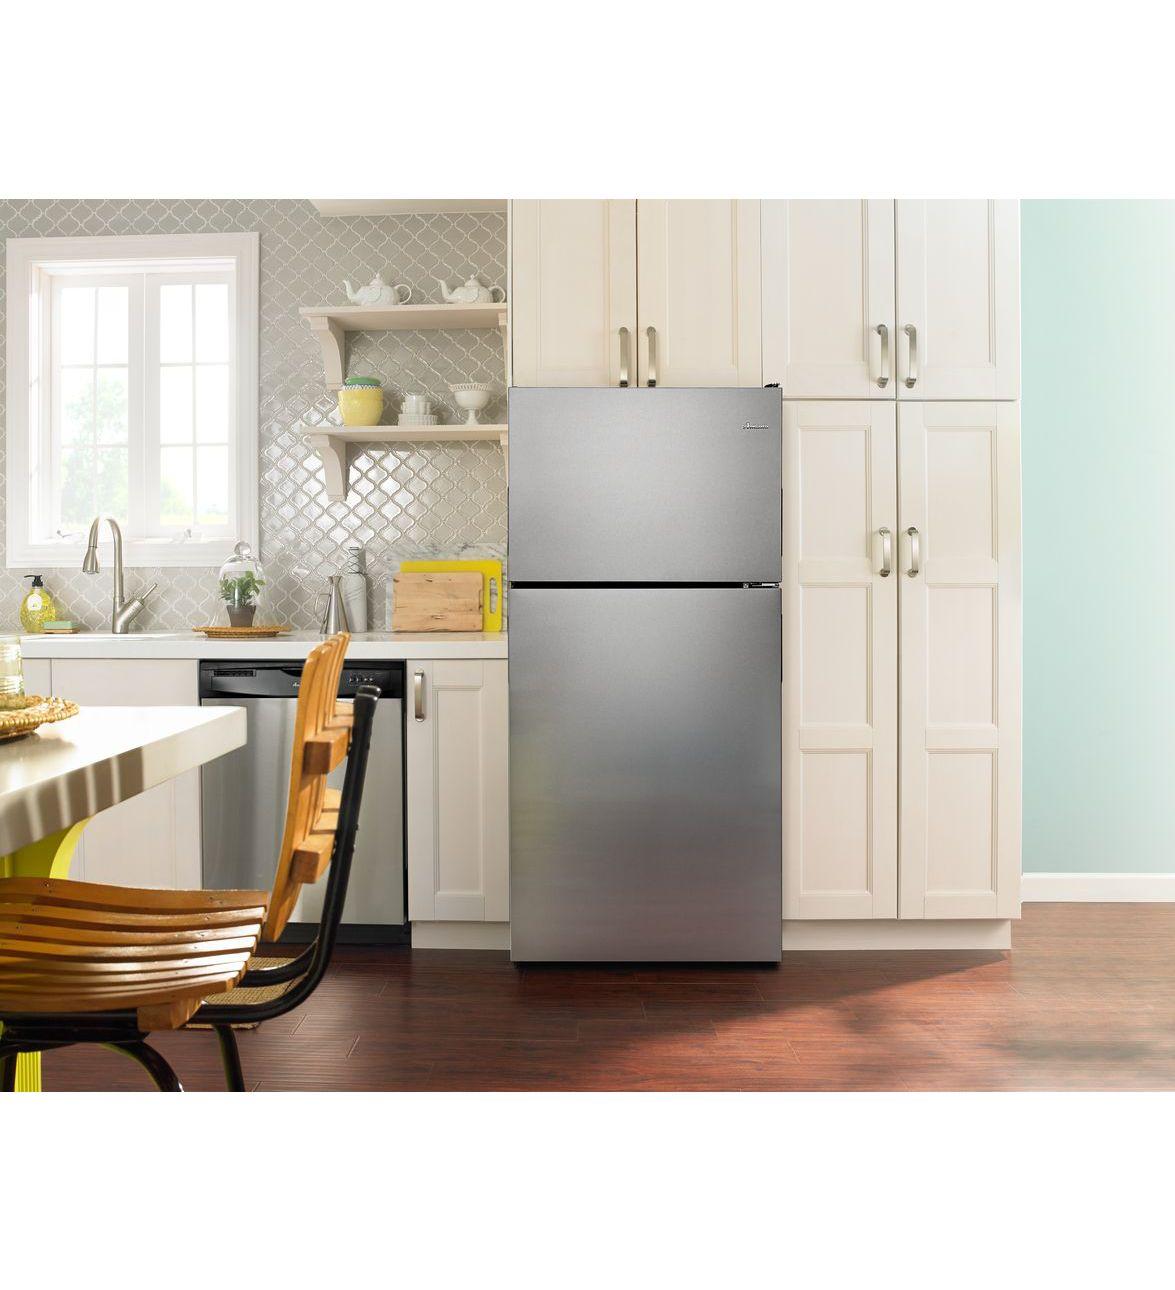 Art308ffdm 30 Inch Wide Top Freezer Refrigerator With